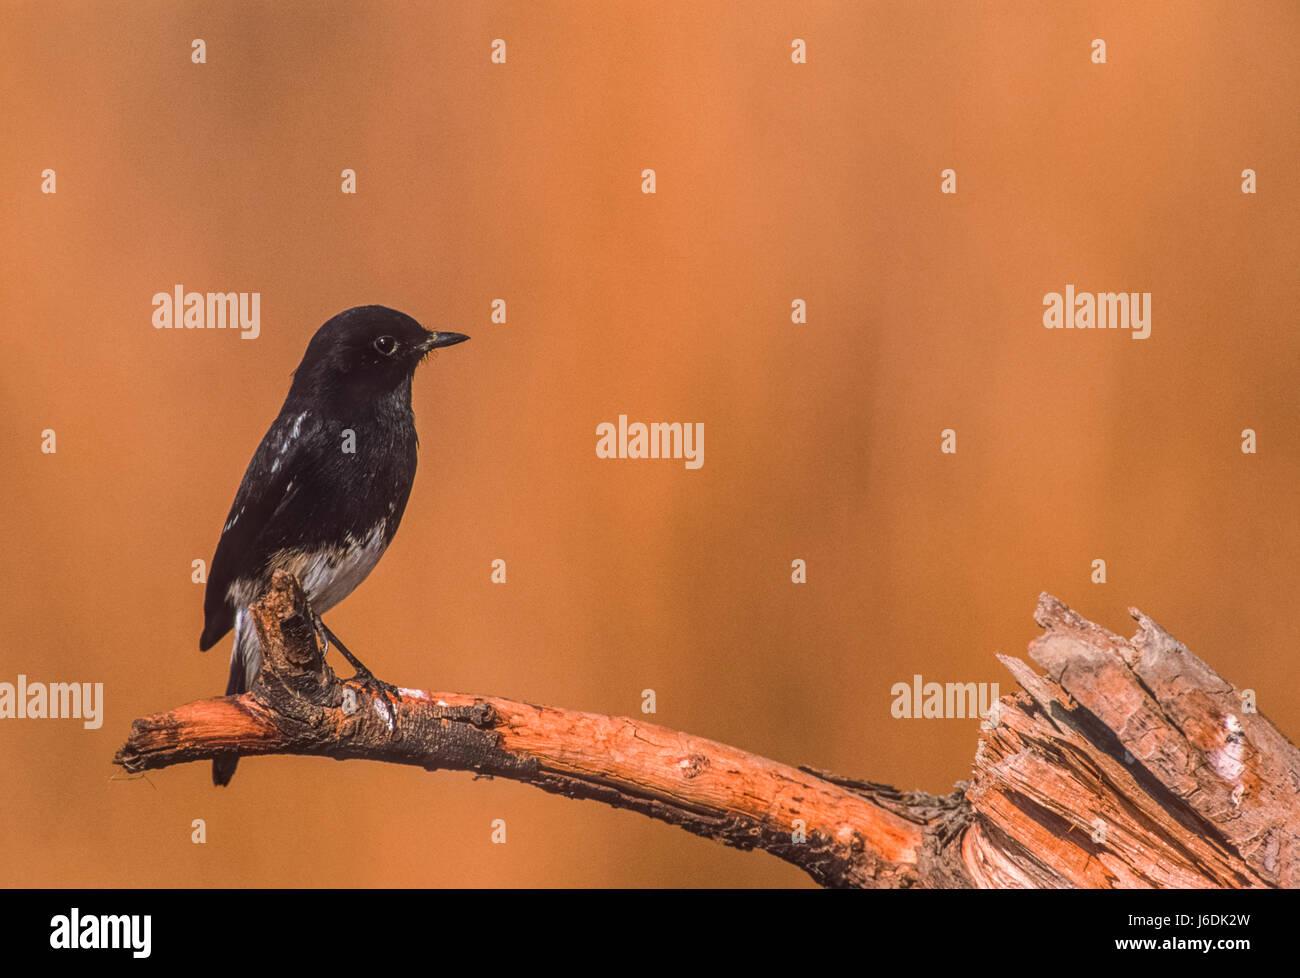 Pied bush chat, (Saxicola caprata),Keoladeo Ghana National Park, Bharatpur, Rajasthan, India - Stock Image